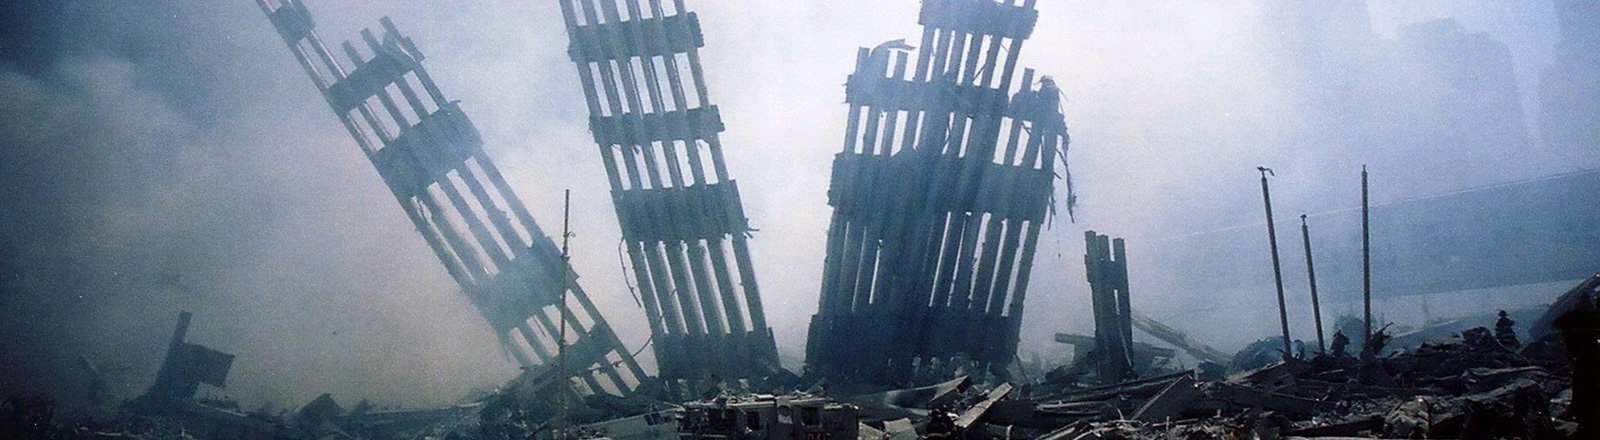 Ruinen des World Trade Centers in New York